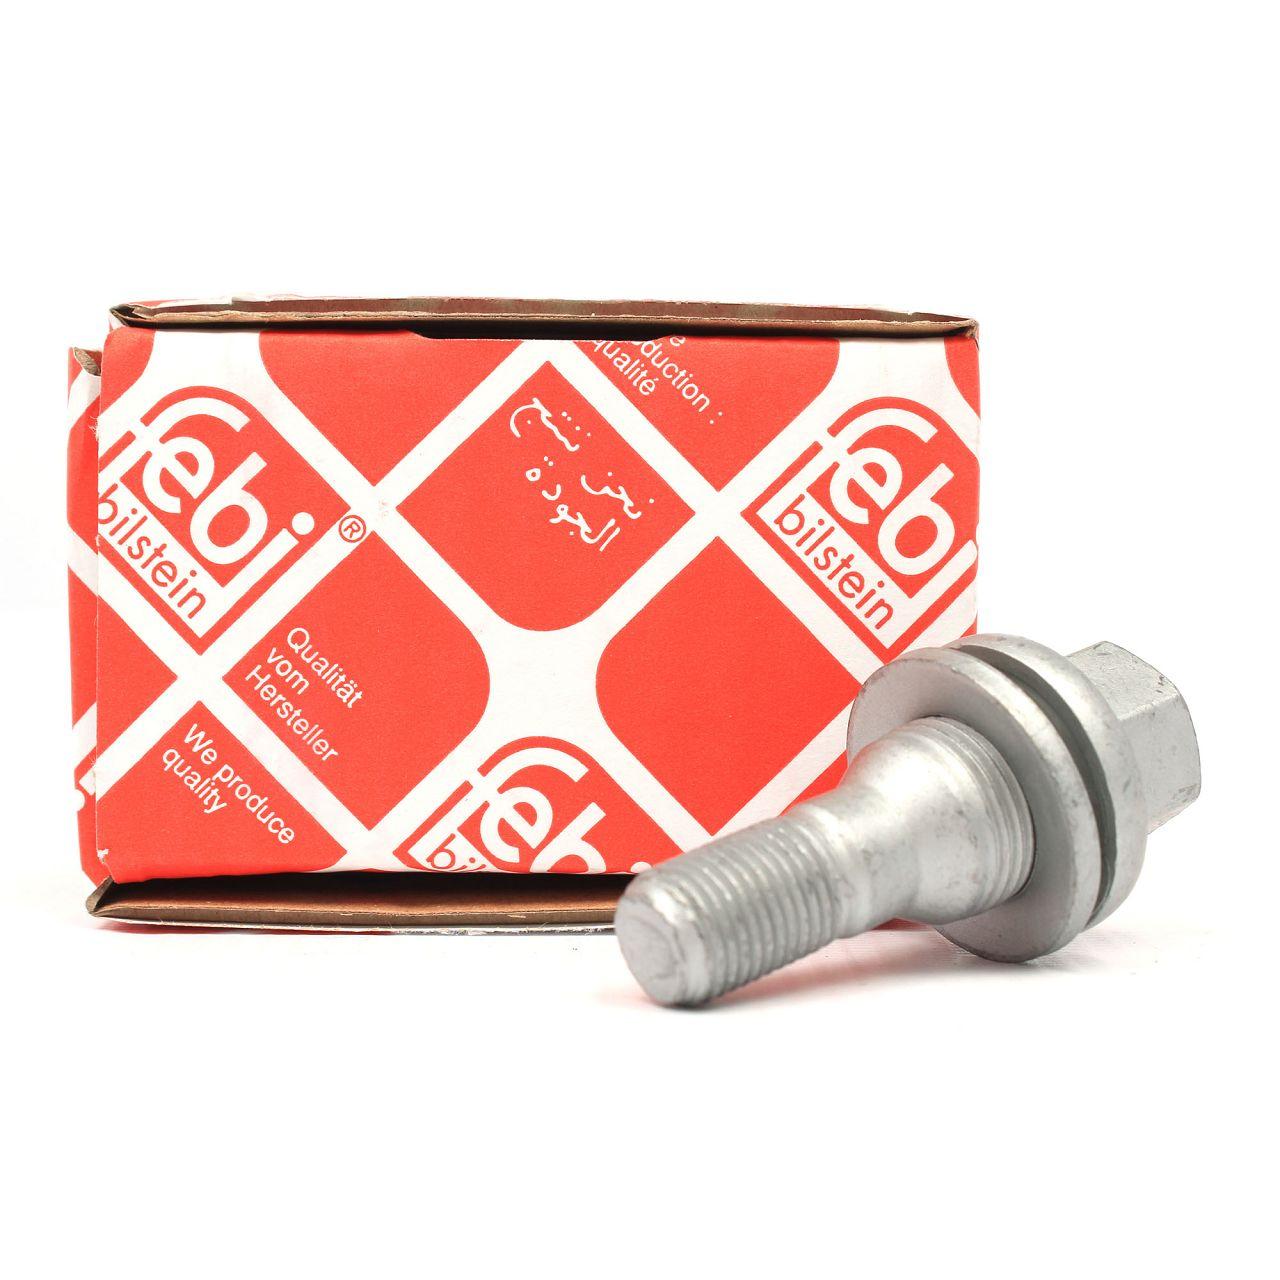 20x FEBI 29208 Radbolzen Radschrauben M12x1,25mm 17mm für CITROEN FIAT PEUGEOT